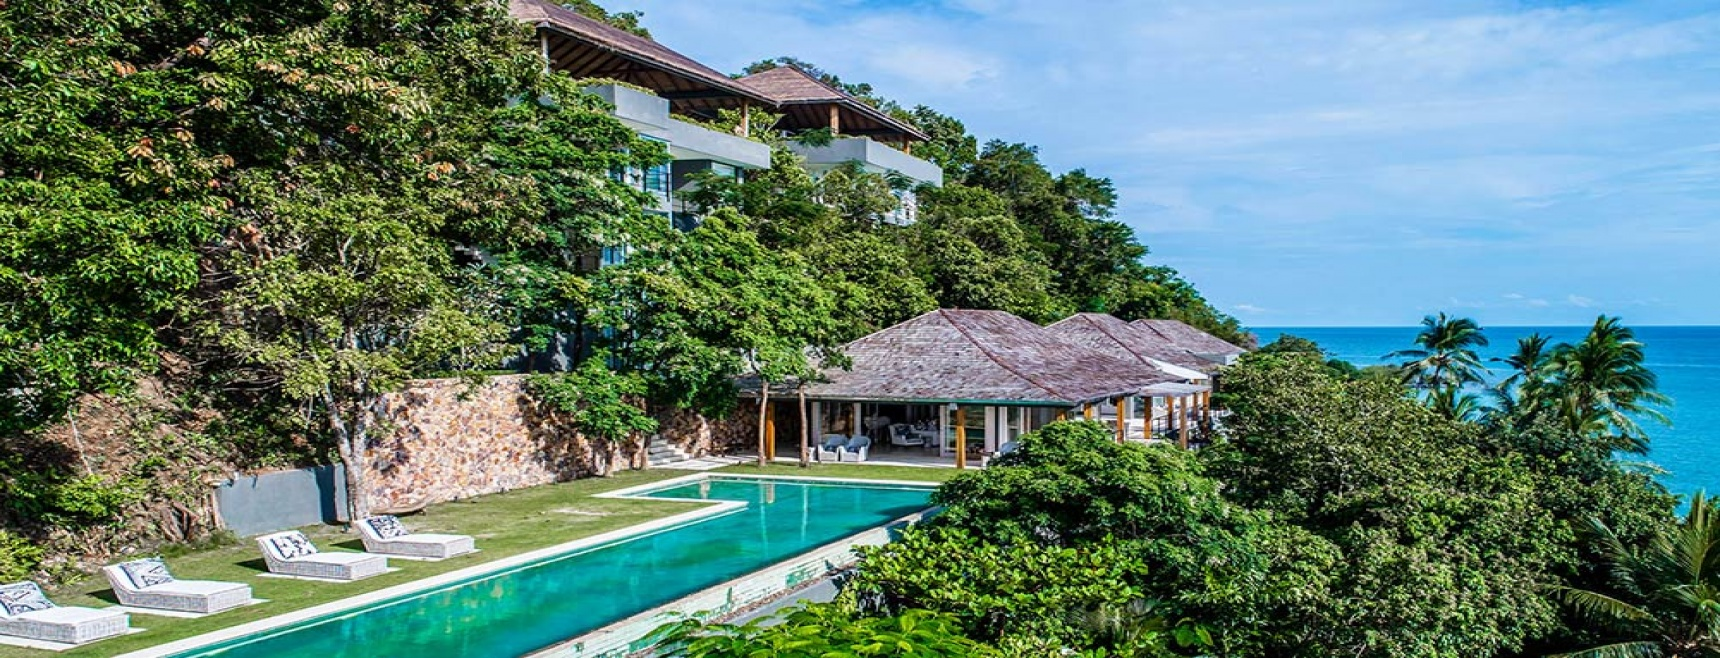 Laem Sor, South West, Koh Samui, 5 Bedrooms Bedrooms, 2 Rooms Rooms,Villa,Holiday Villa Rentals,1,1529